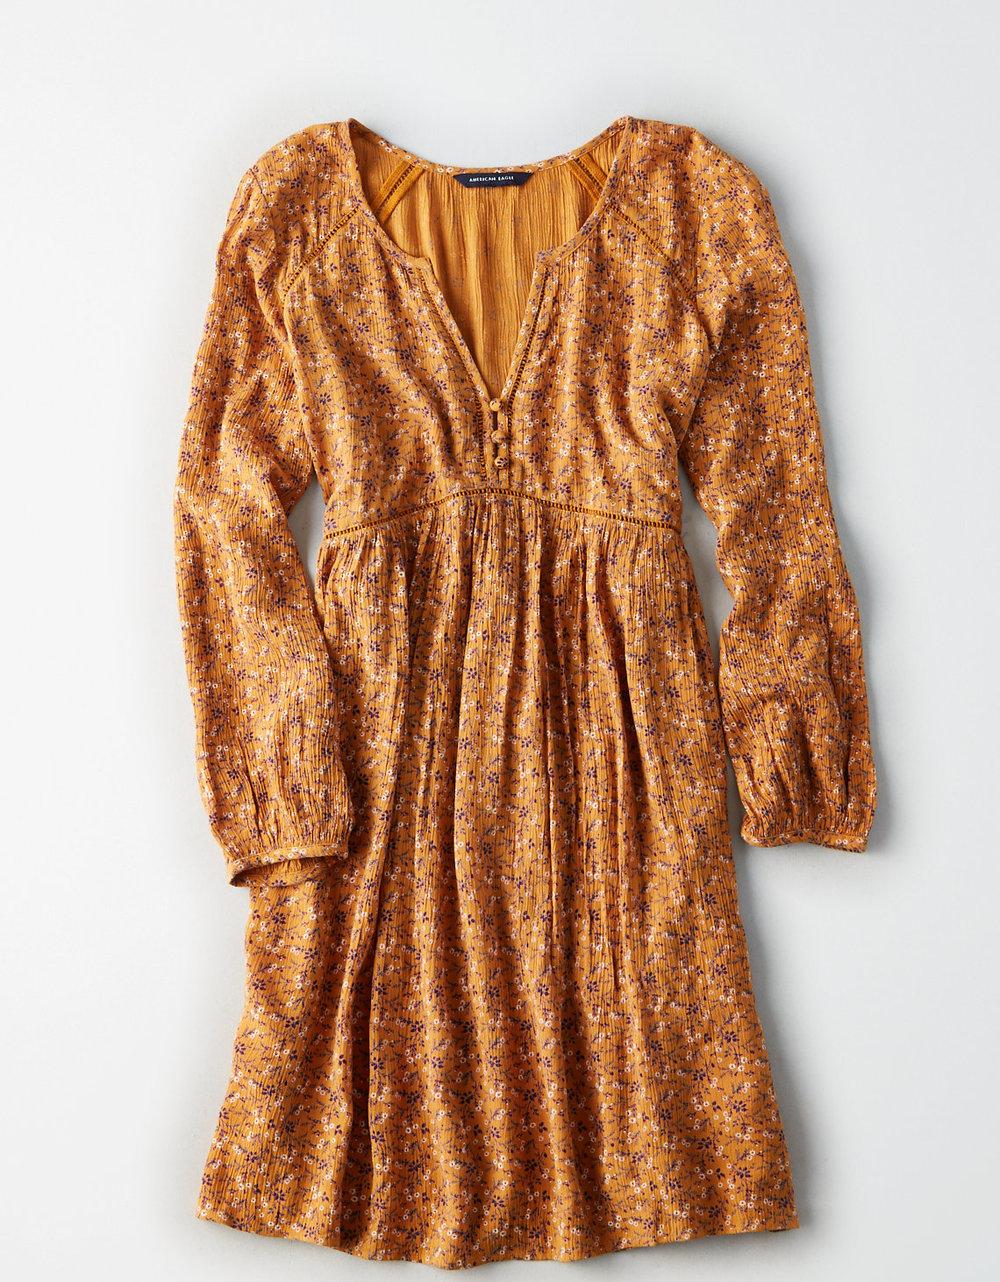 FLORAL SHIFT DRESS - @americaneagle